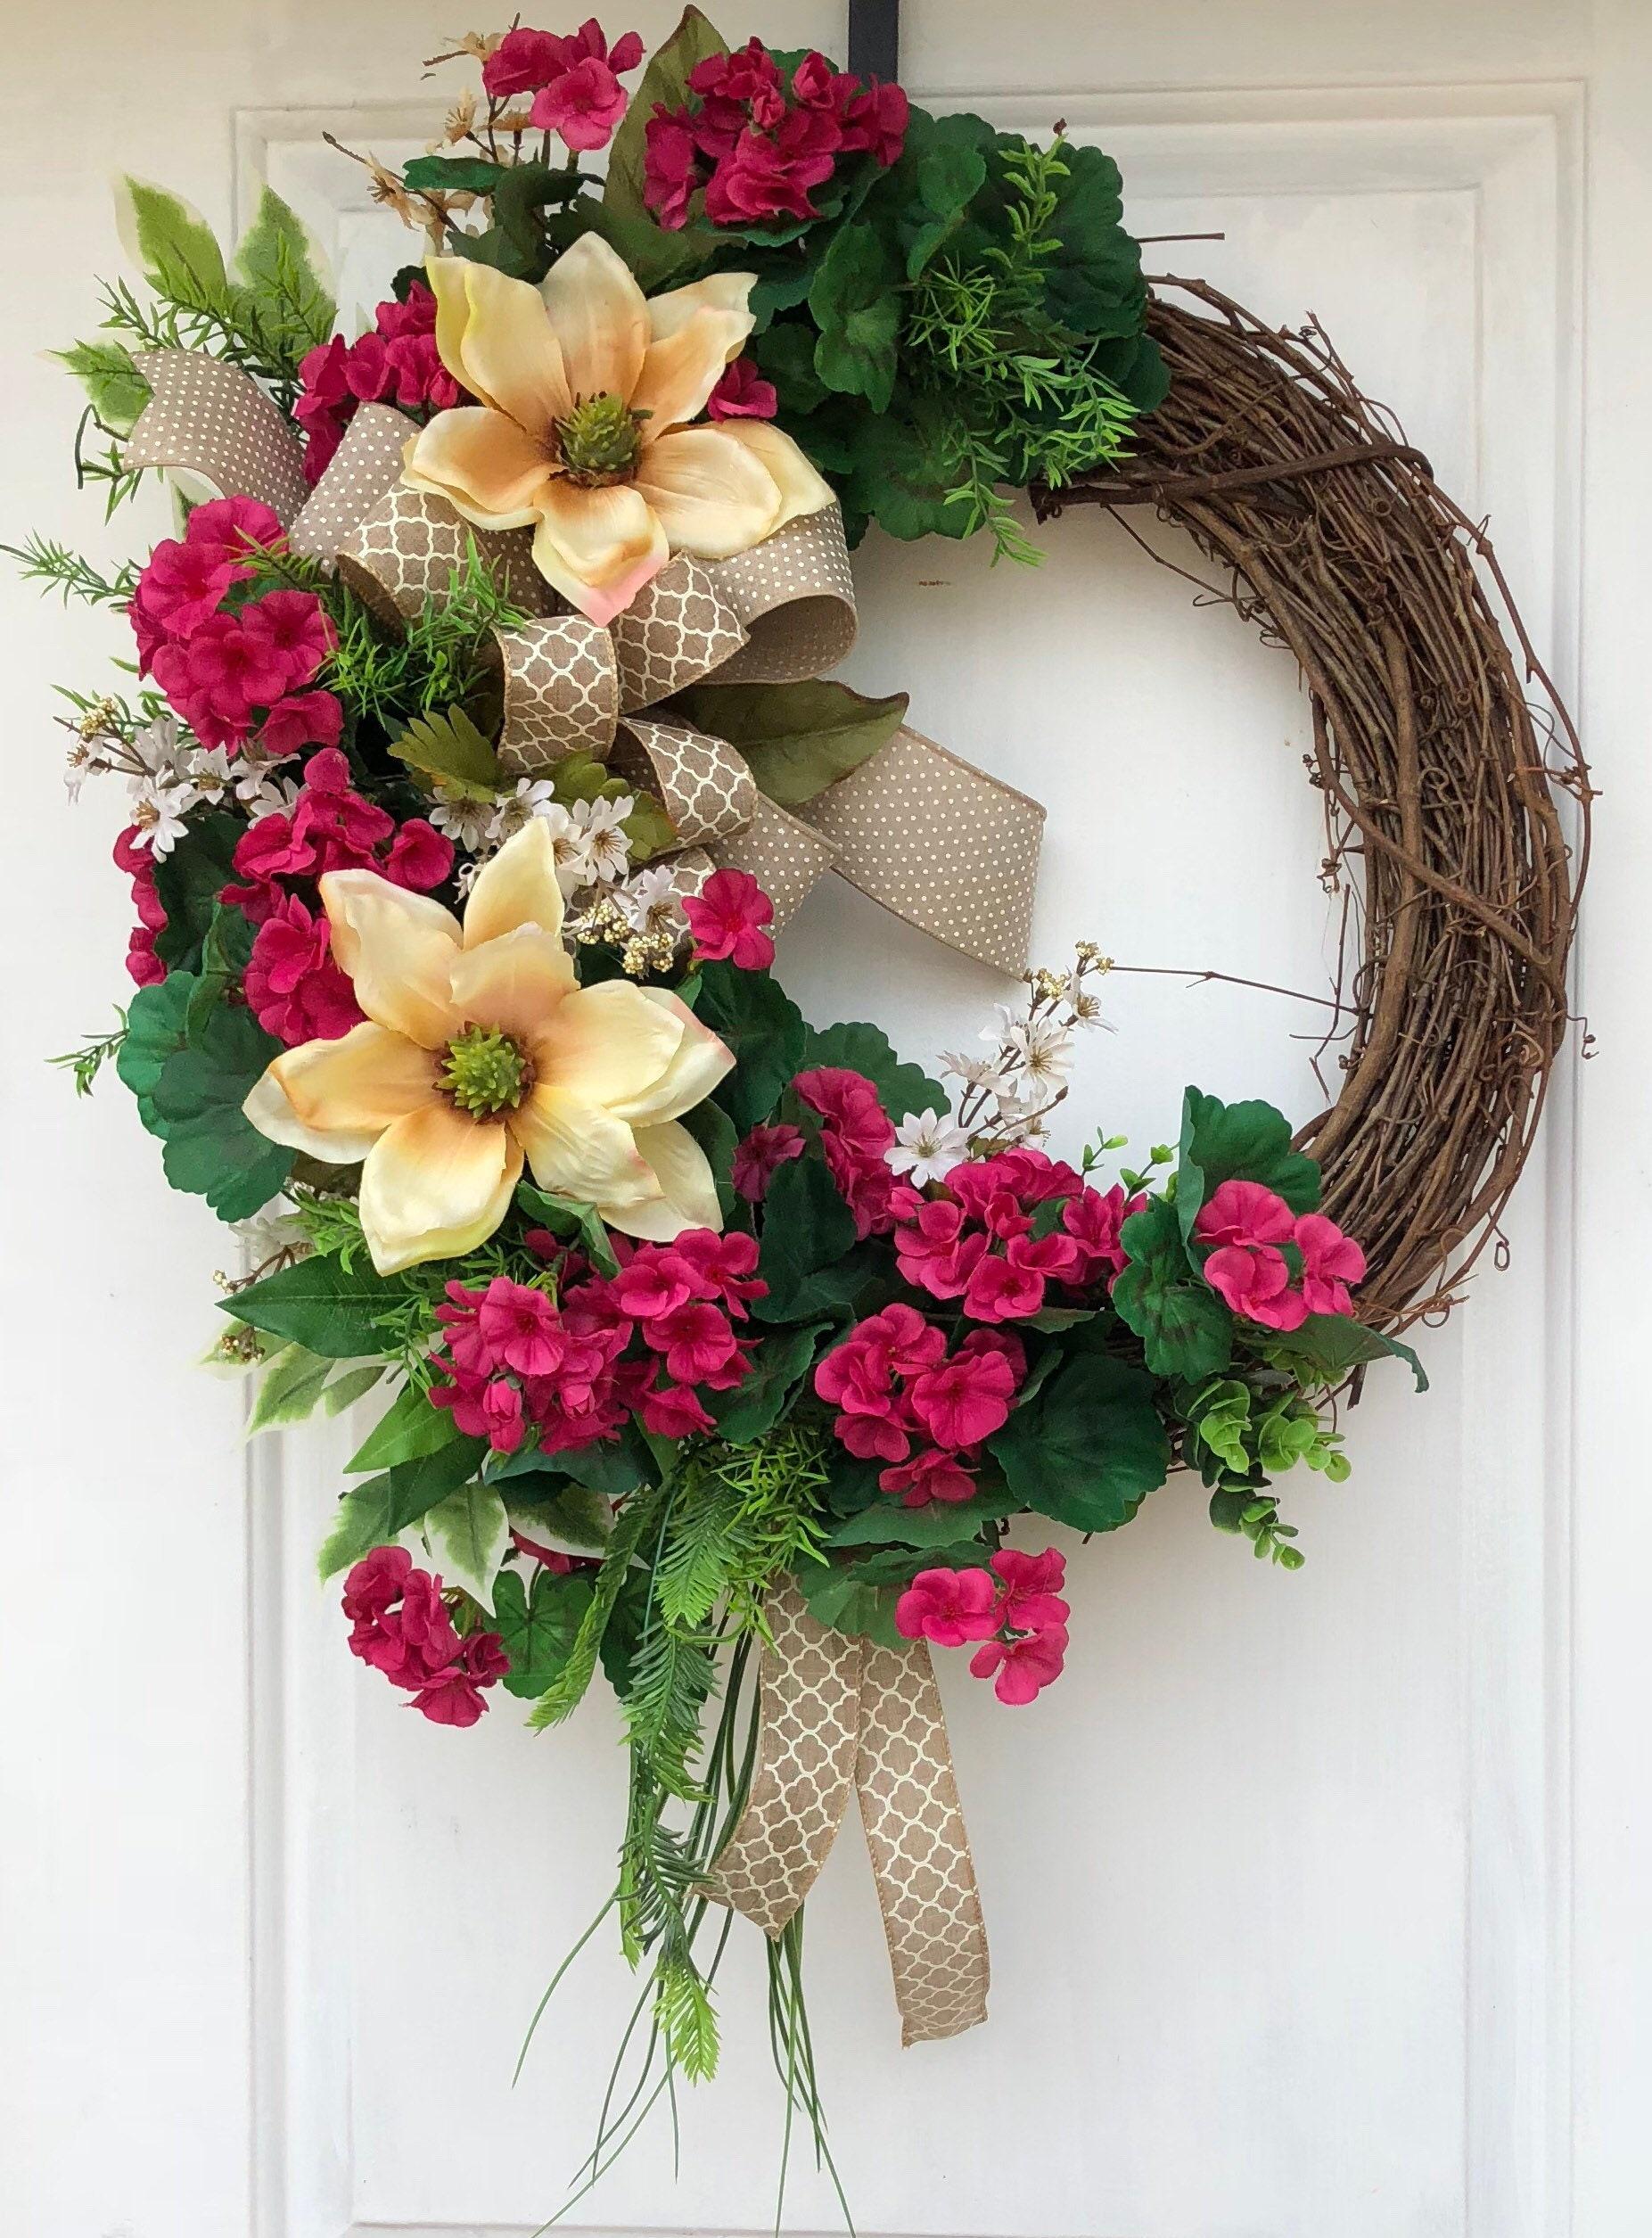 Monogram Wreath Everyday Wreath Grapevine Wreath Wreath For Front Door Bridal Gift Wreath